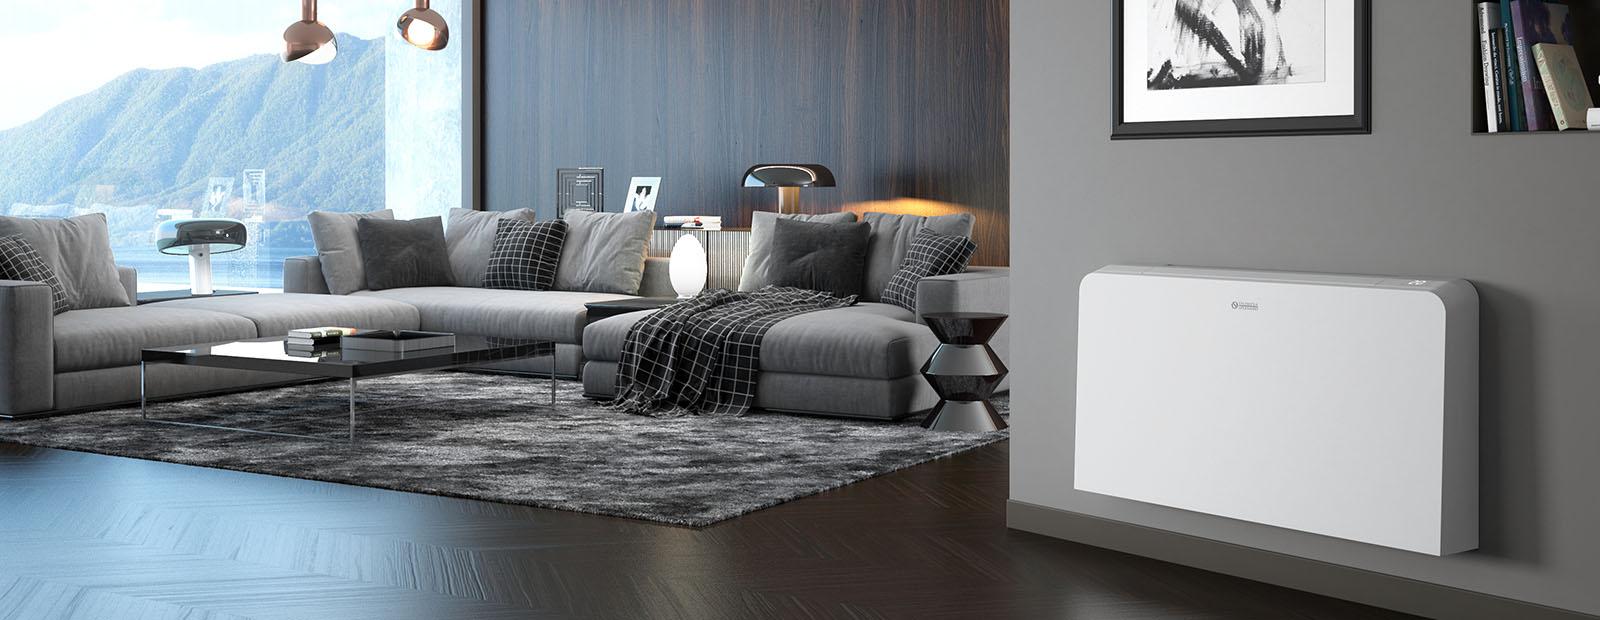 bi2 sl air inverter olimpia splendid. Black Bedroom Furniture Sets. Home Design Ideas